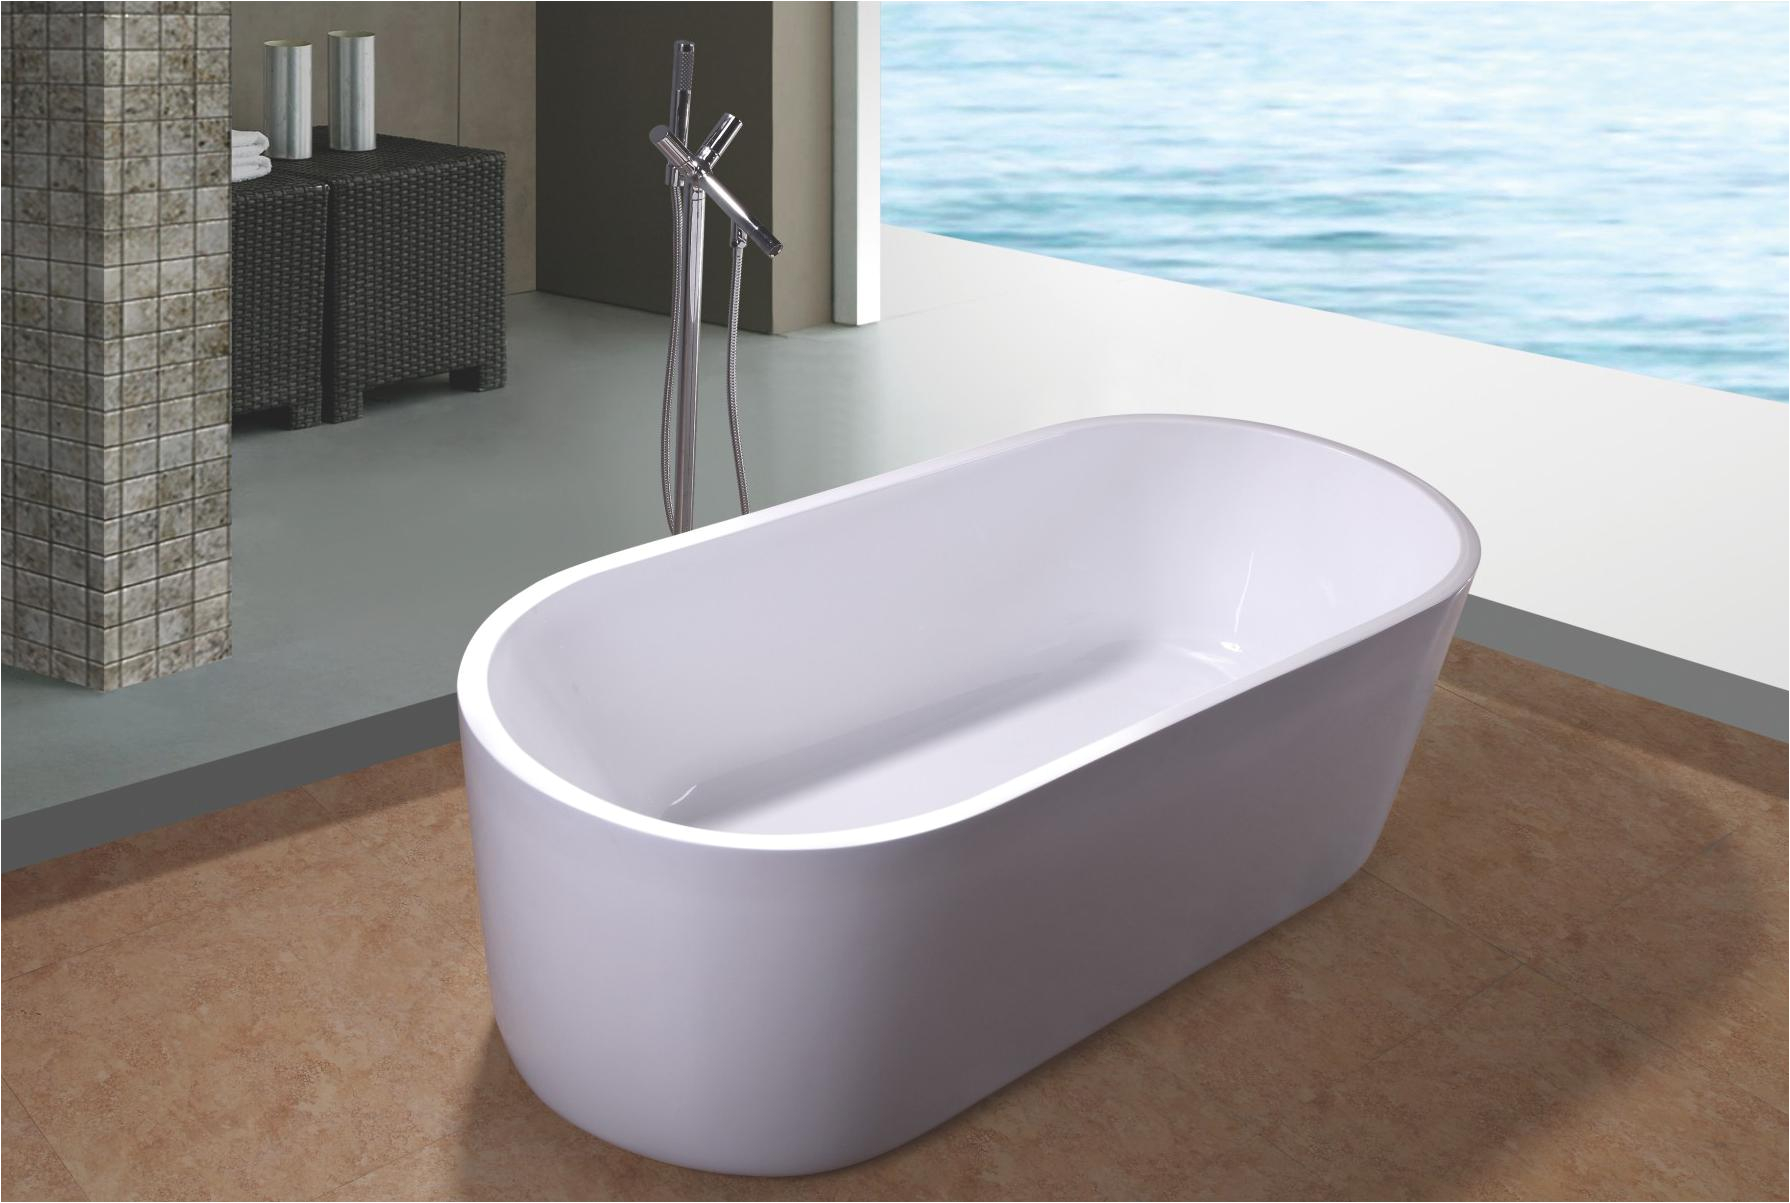 Clawfoot Bathtubs for Sale In Ontario Bathrooms Amazing Free Standing Bath Tubs for Bathroom